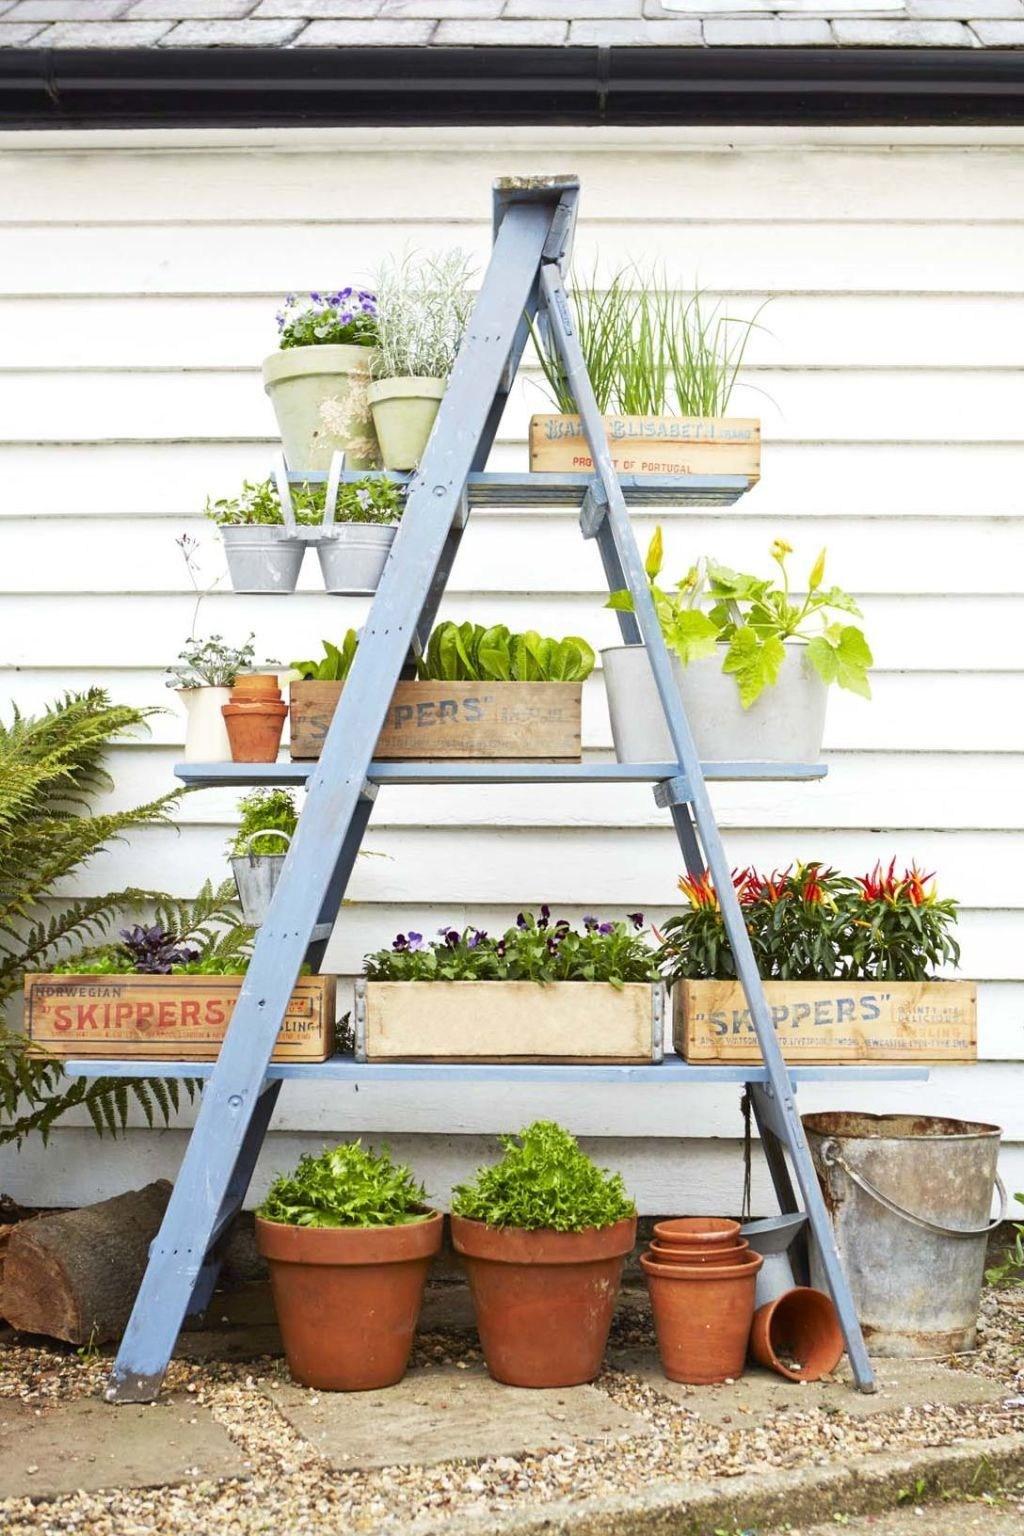 16 Container Gardening Ideas Potted Plant Ideas We Love | Outdoor Garden Under Stairs | Small | Crosstie | Gardening | Landscaping | Lawn